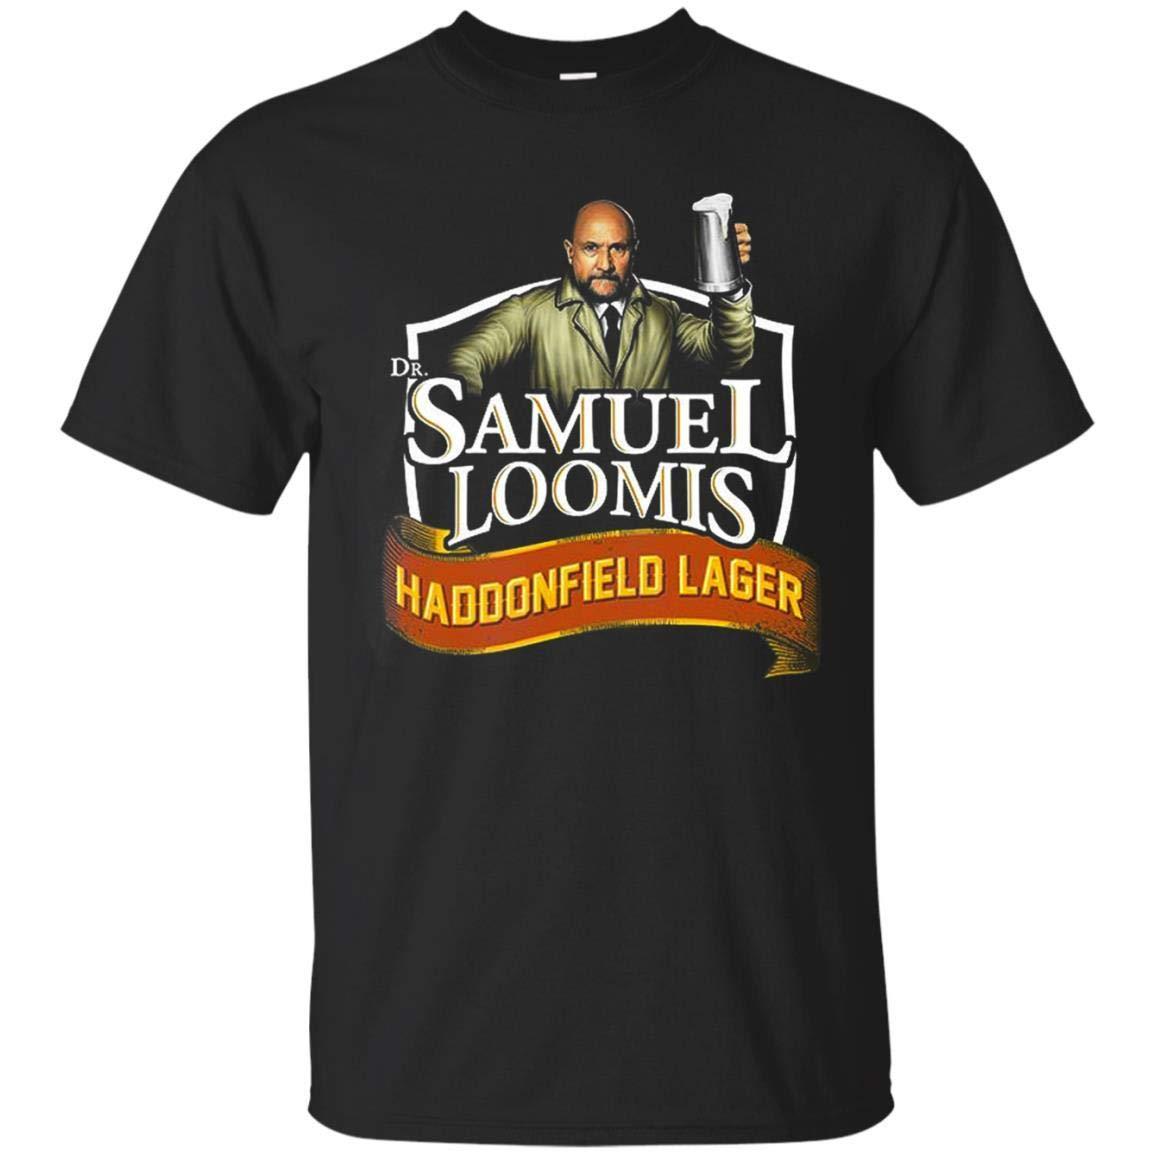 Dr Samuel Loomis Haddonfield Lager Classic T Shirt